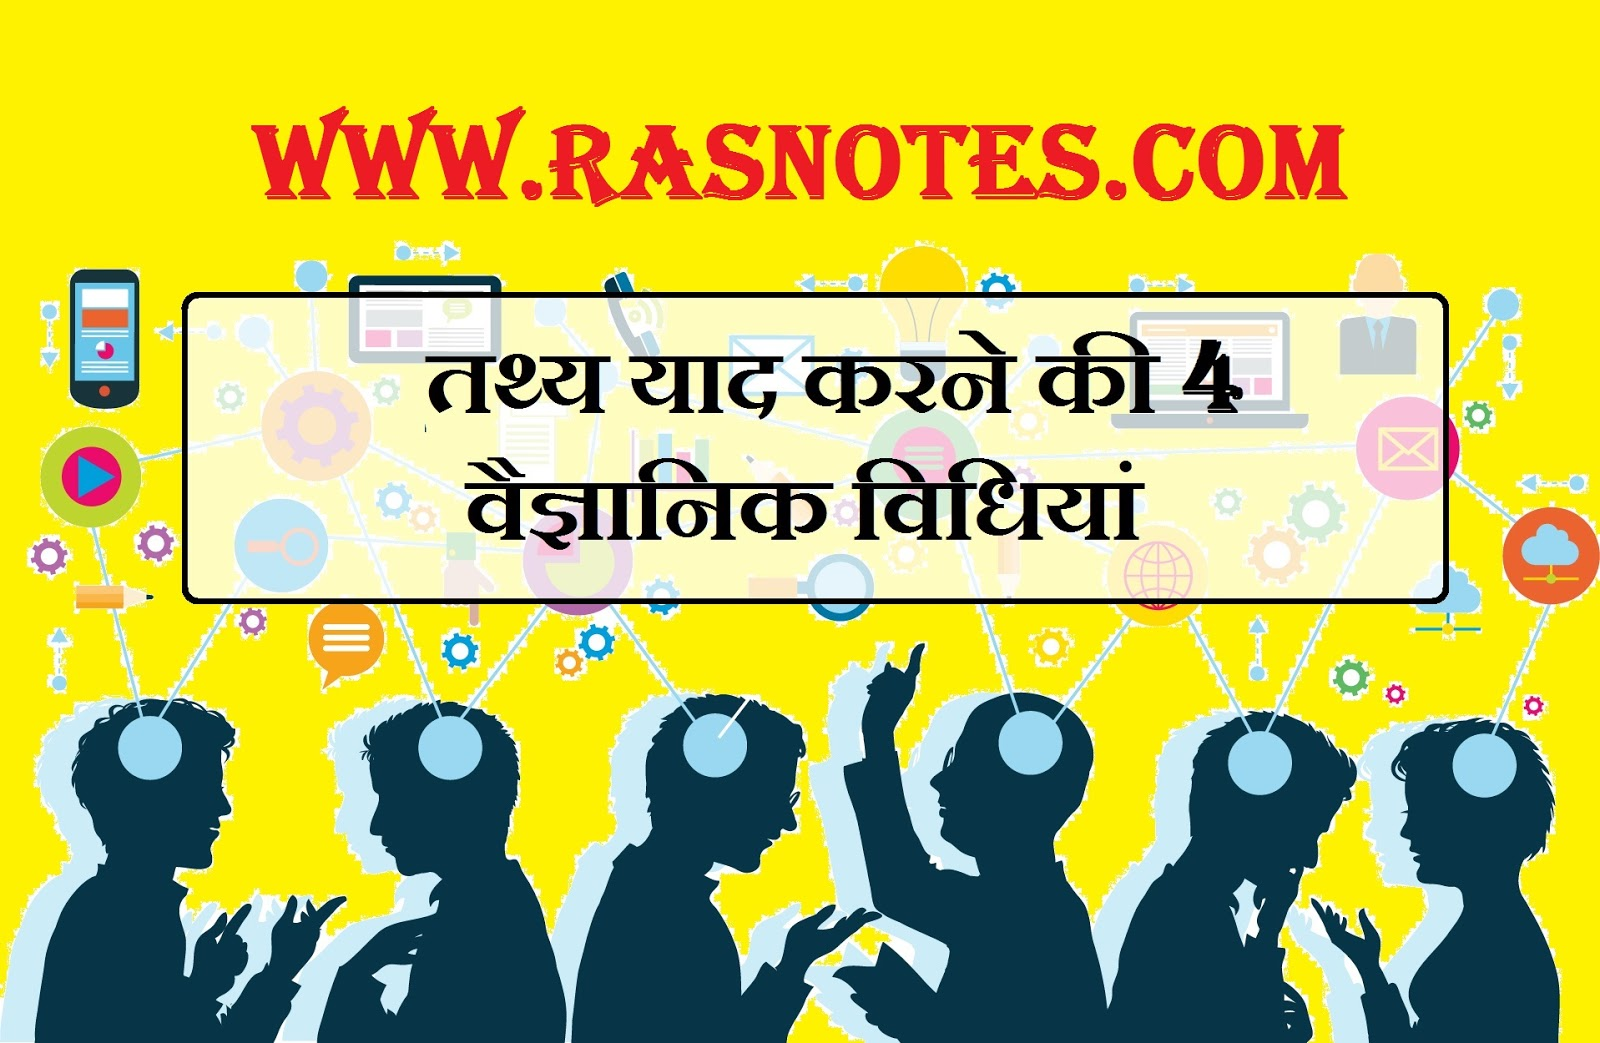 ras pre 2017, ras pre exam, ras pre exam prepration, exam tips in hindi, notes for ras exam in hindi pdf, ras exam 2017 prepration tips